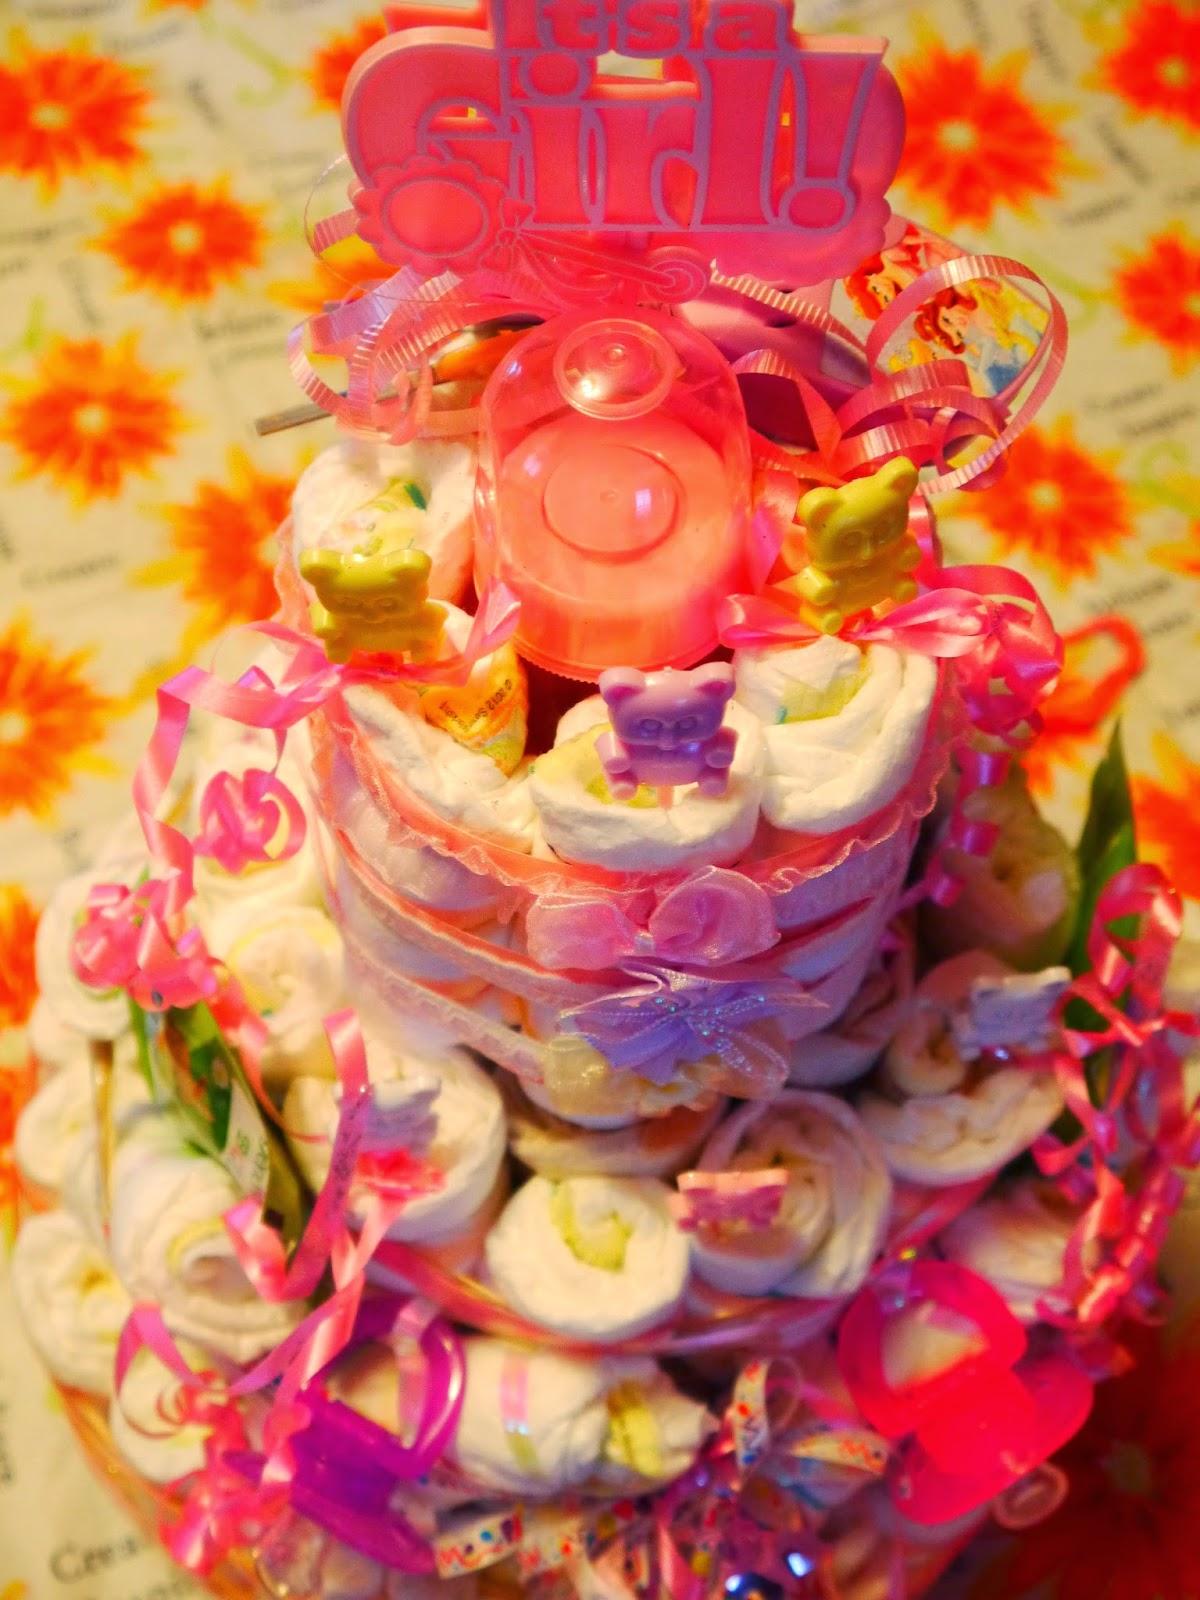 How to make a Diaper Cake 1/28/2015